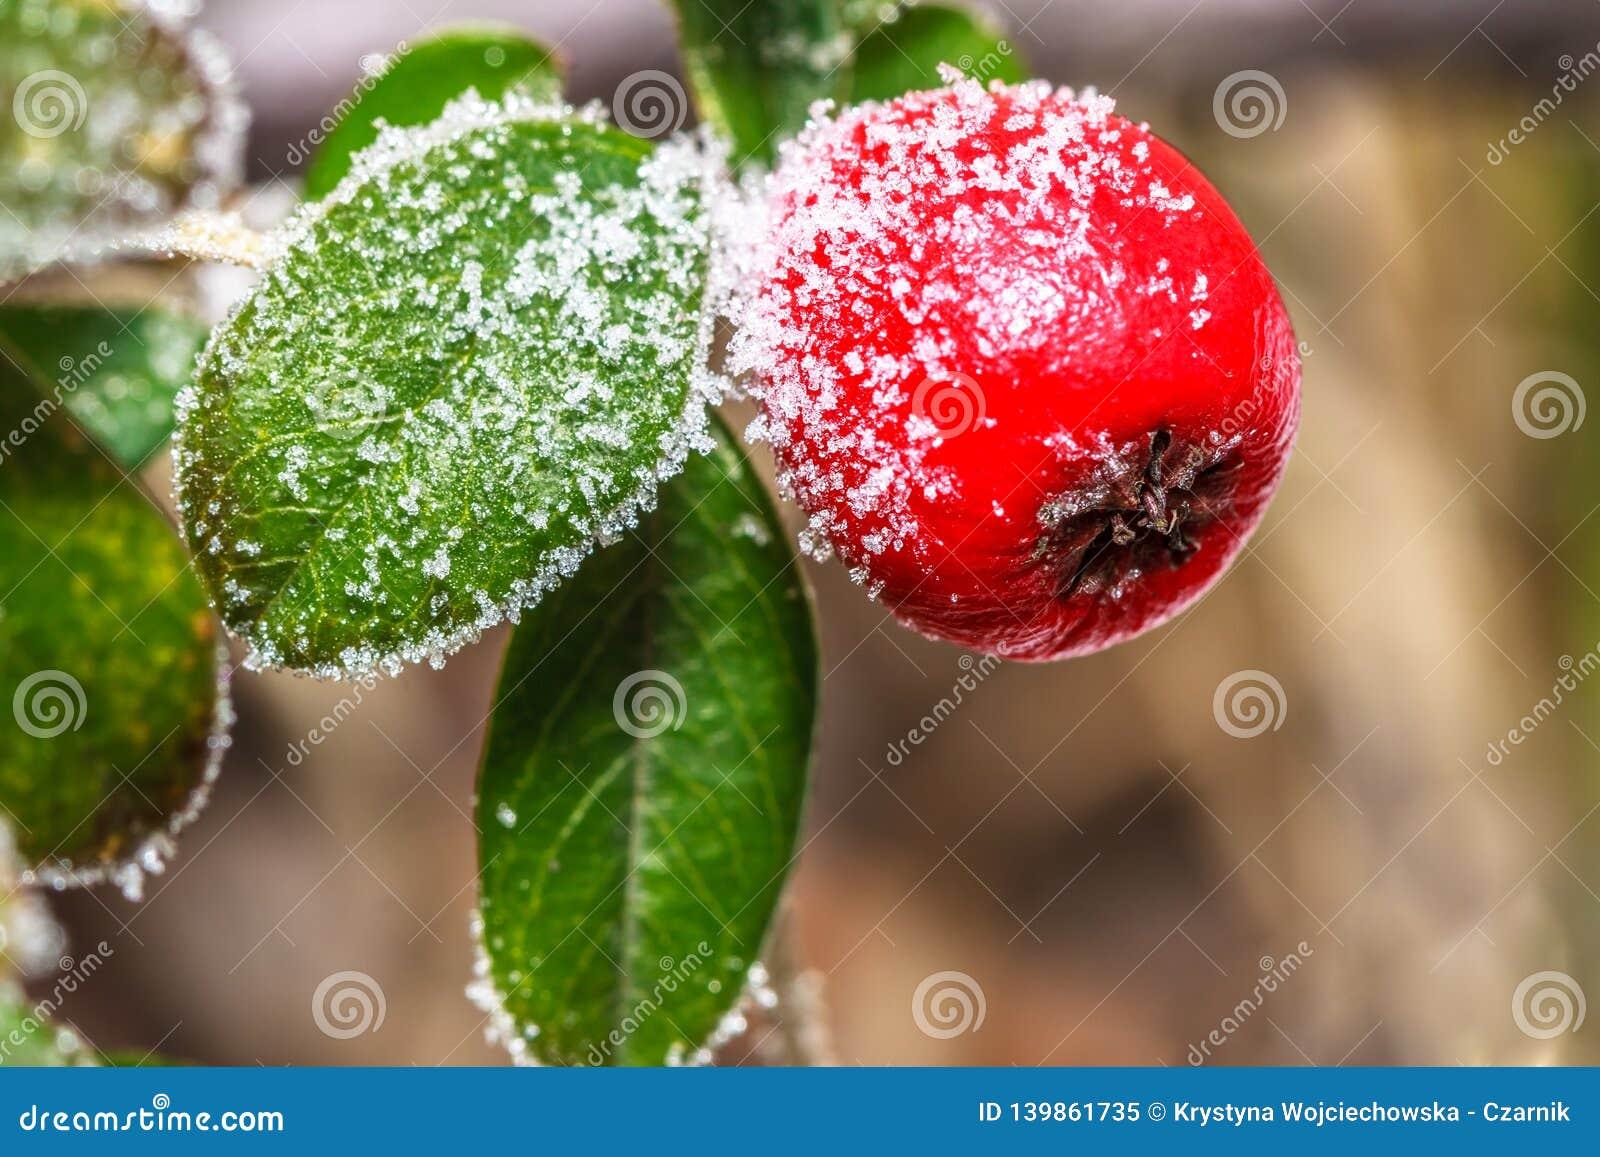 Frozen holly berrie